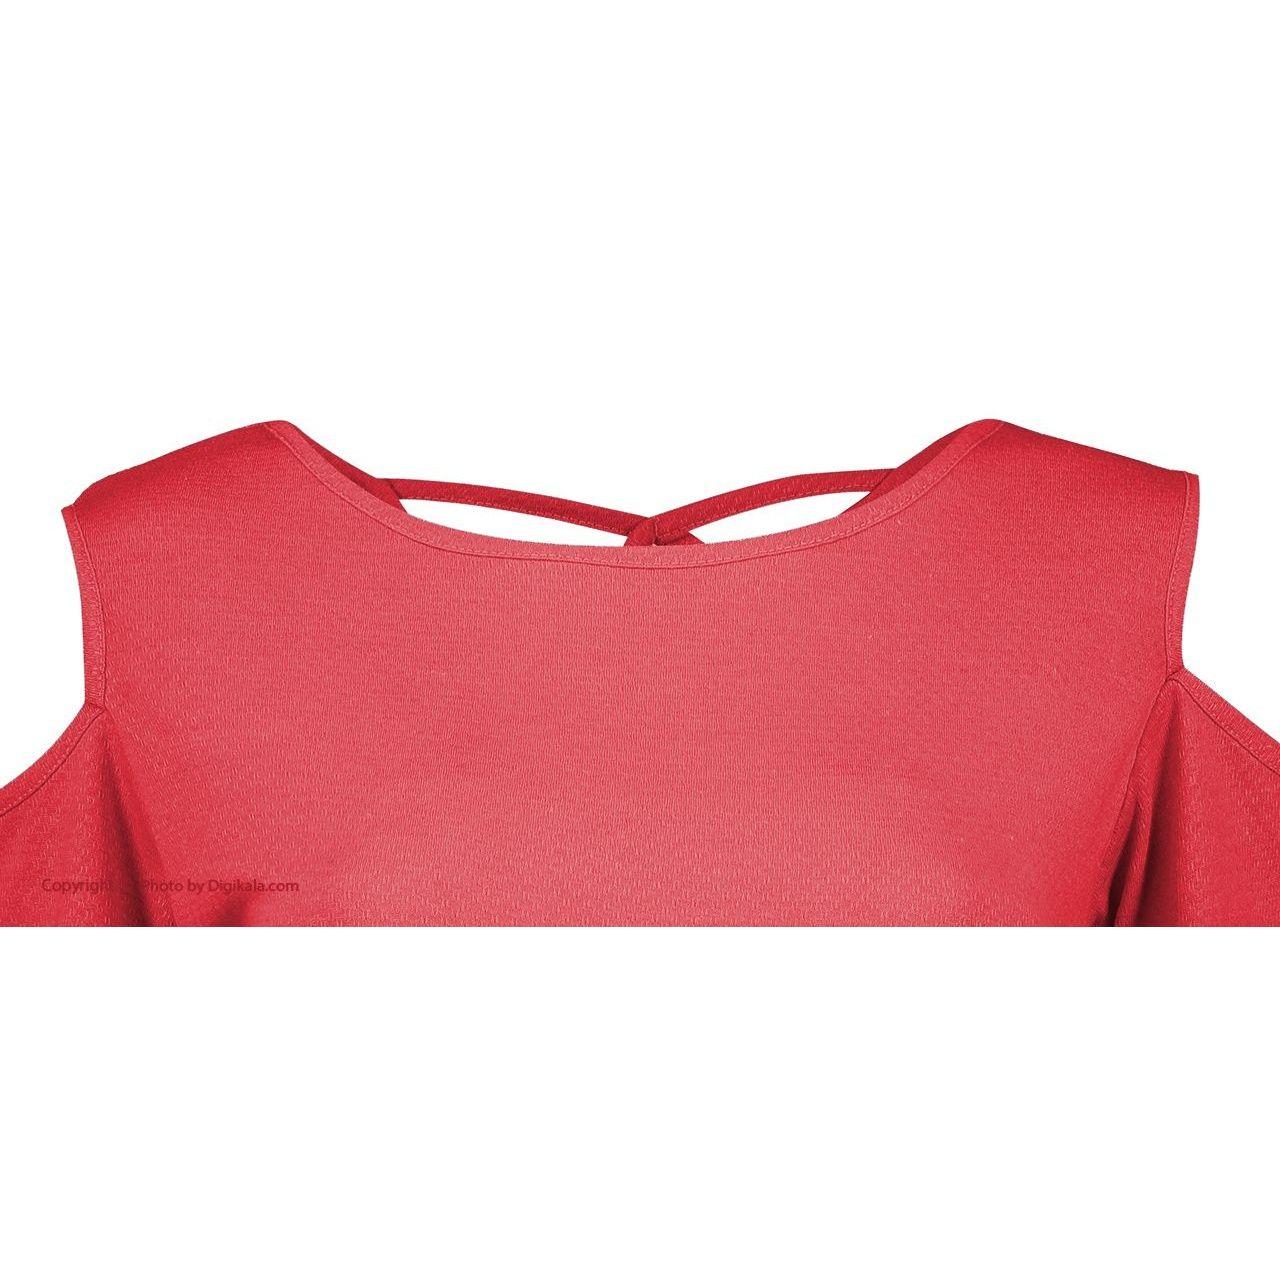 بلوز زنانه افراتین کد 2526-3 رنگ قرمز -  - 2